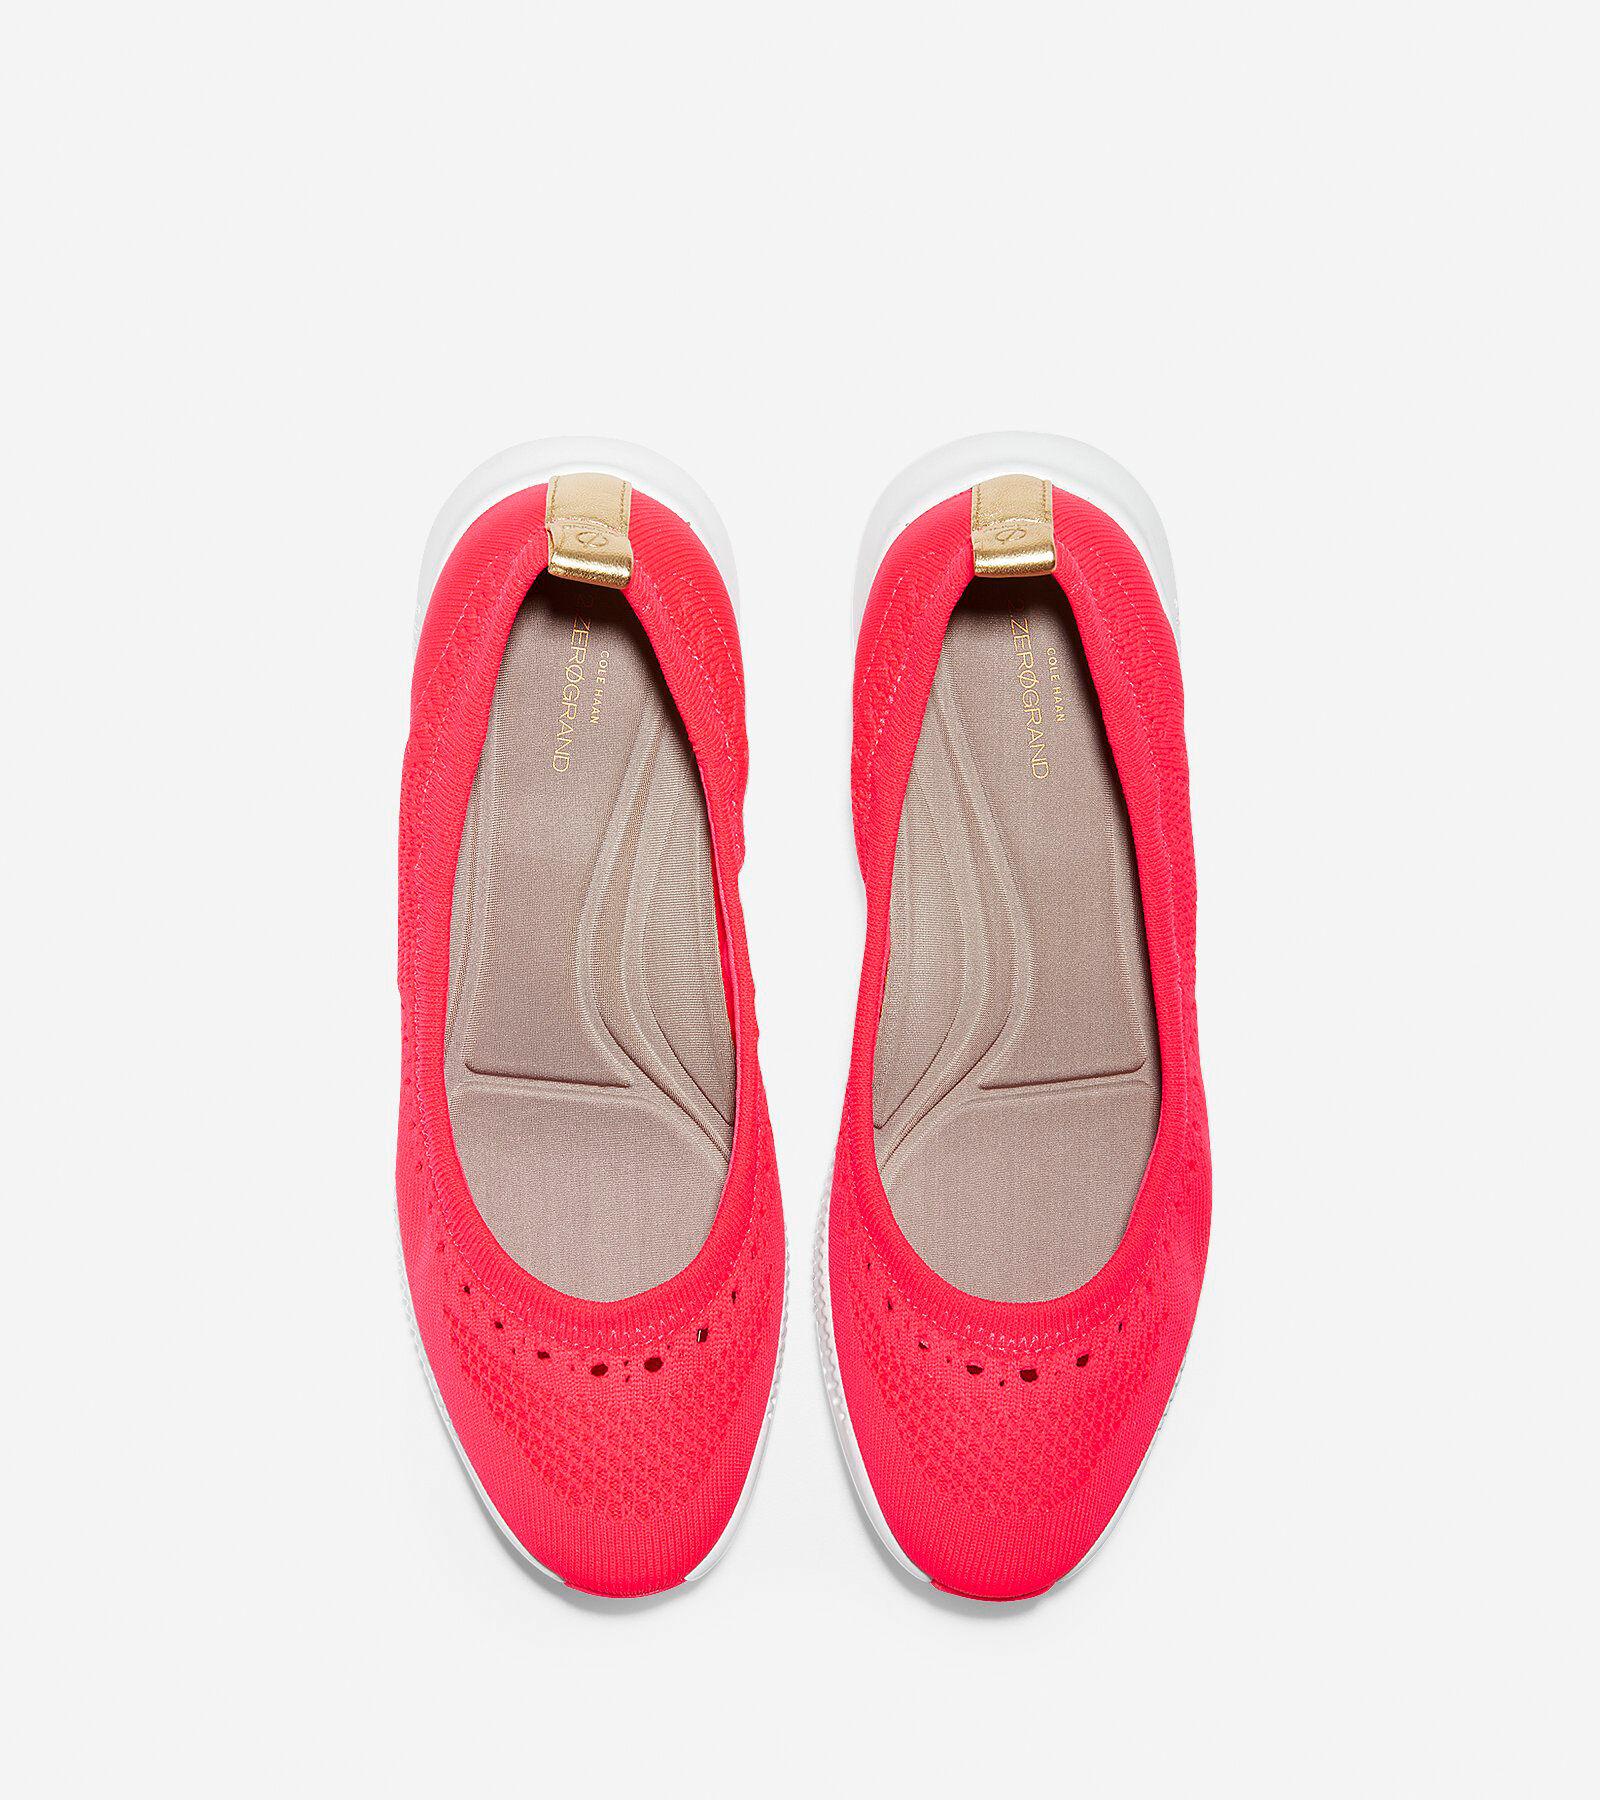 Women's Ballet Cole Knit Flats Stitchlite Haan zerogrand Flash In 2 rq4wZ7Baxr